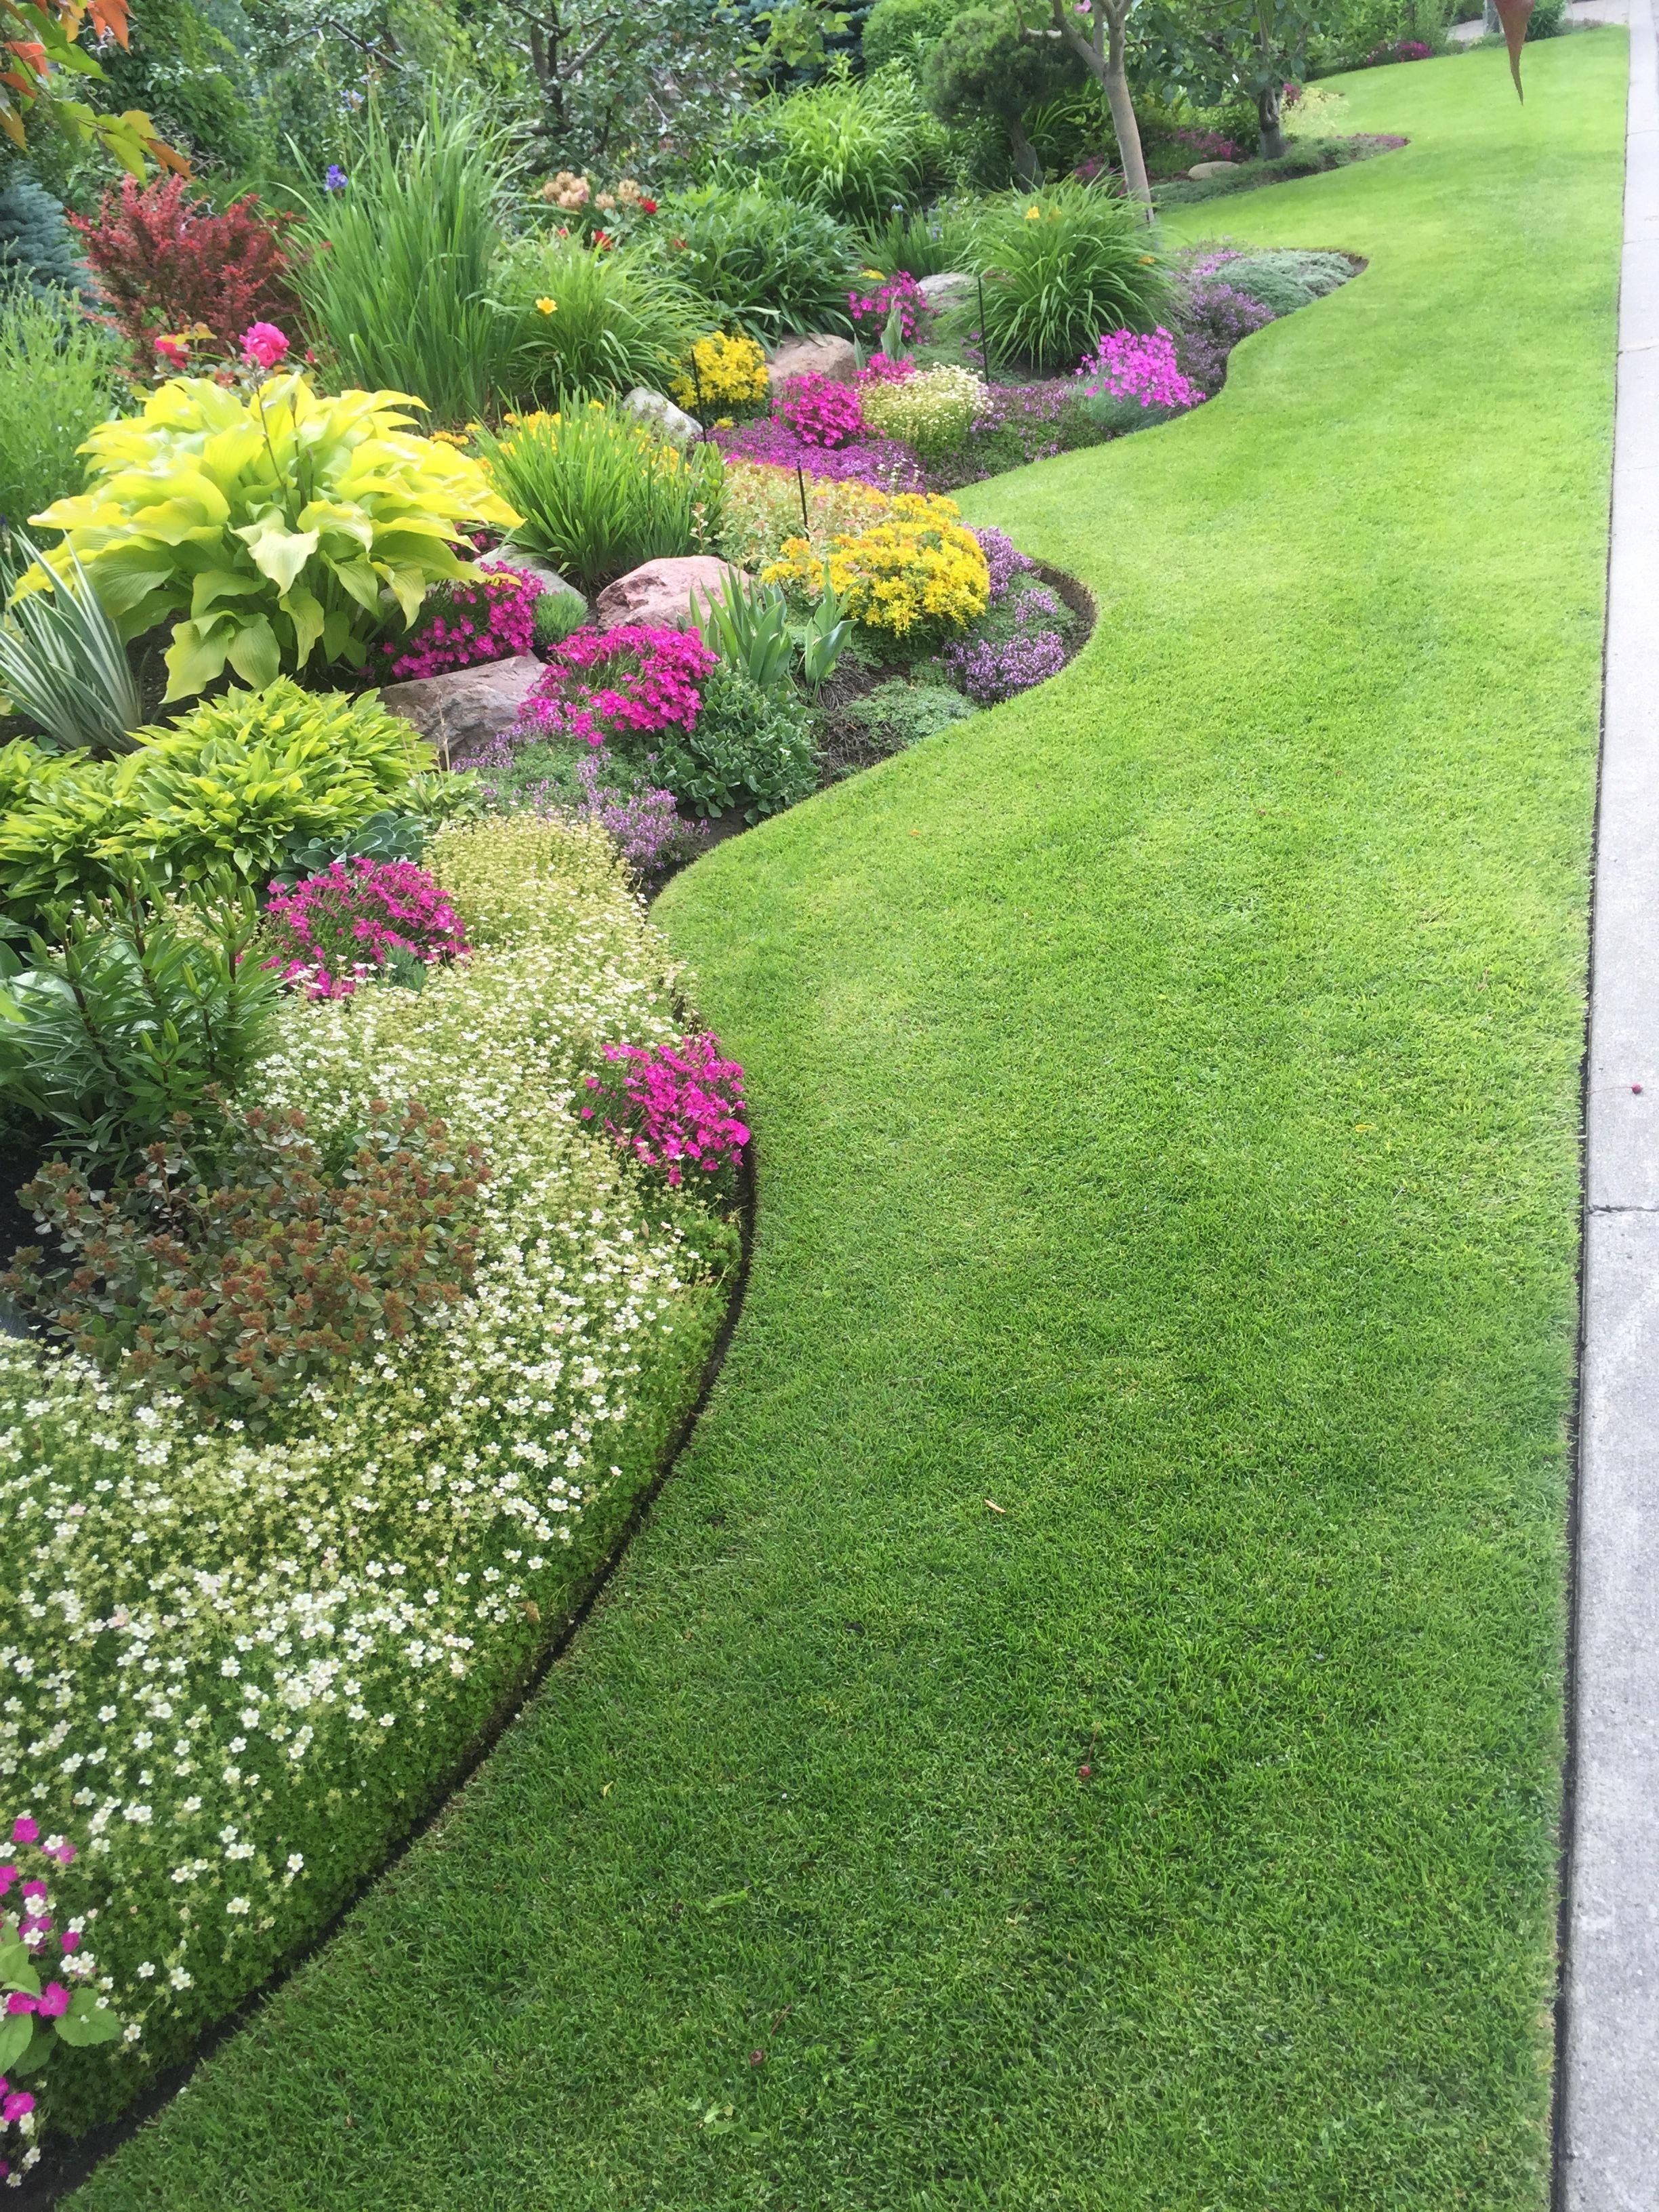 I Love The Perfect Edging 18 Splendid Front Yard Landscaping Ideas And Garden Desig Garden Design Layout Landscaping Landscape Design Front Yard Landscaping Backyard border landscaping ideas